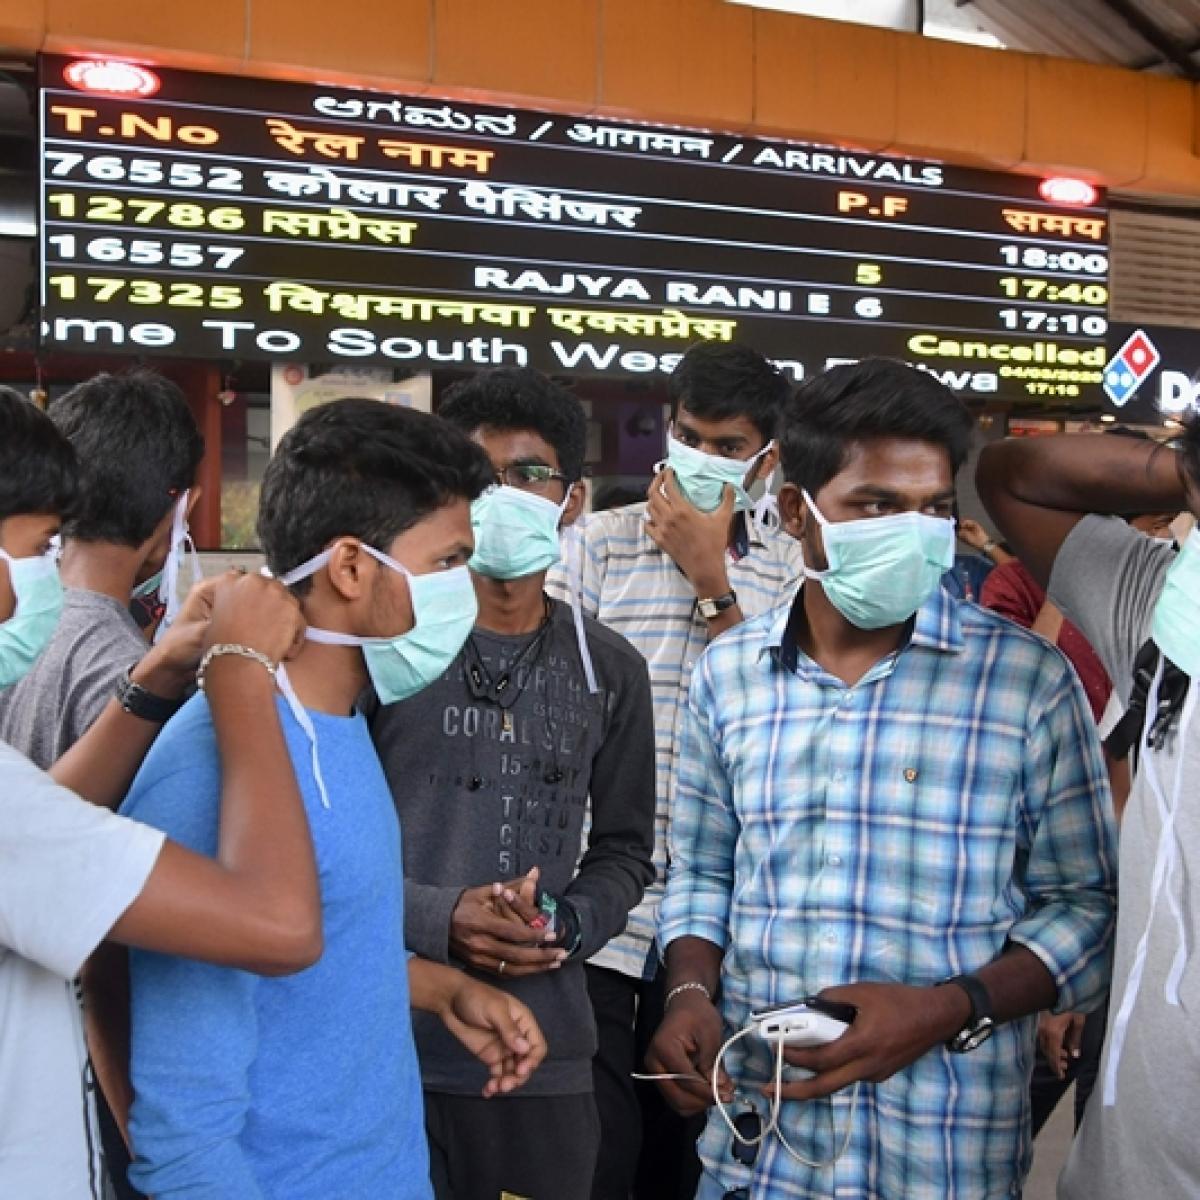 Latest coronavirus update in India: IIM-Bangalore convocation put off over virus fears